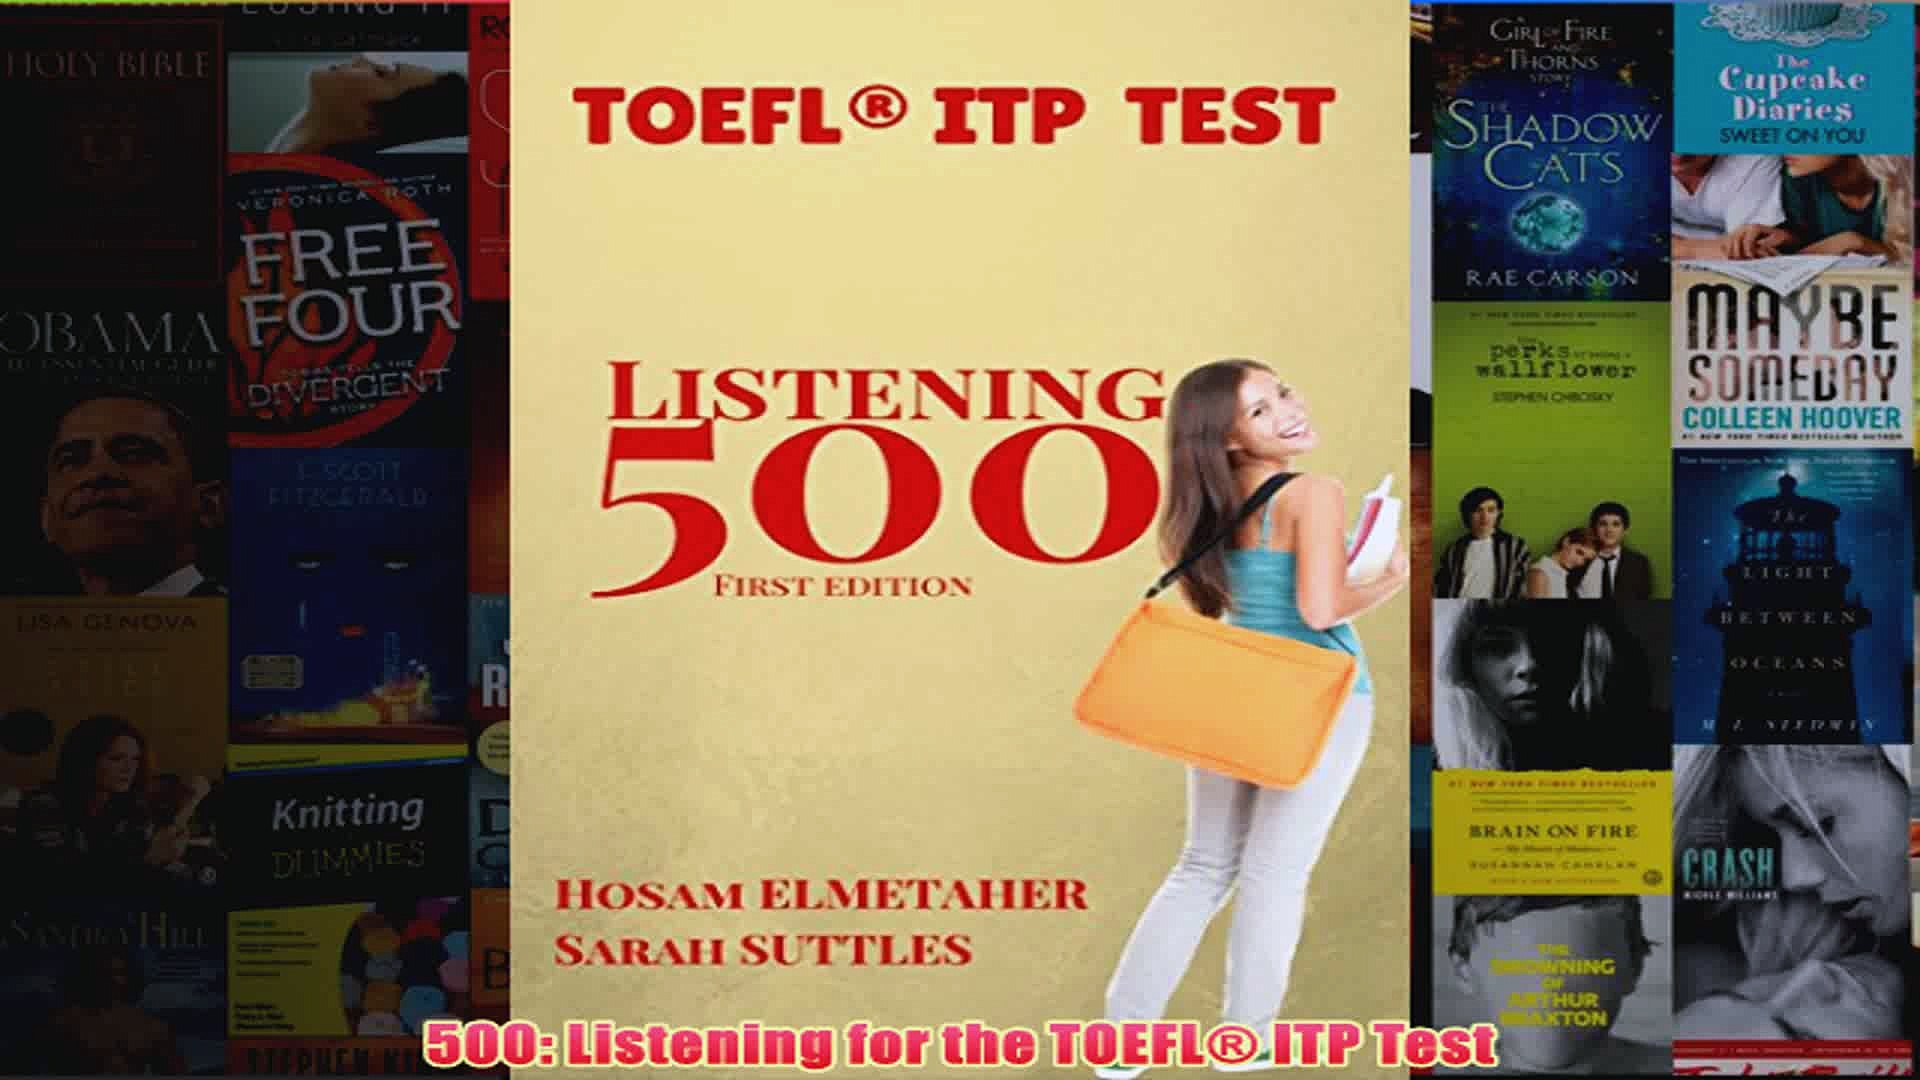 toefl pbt practice test free download pdf